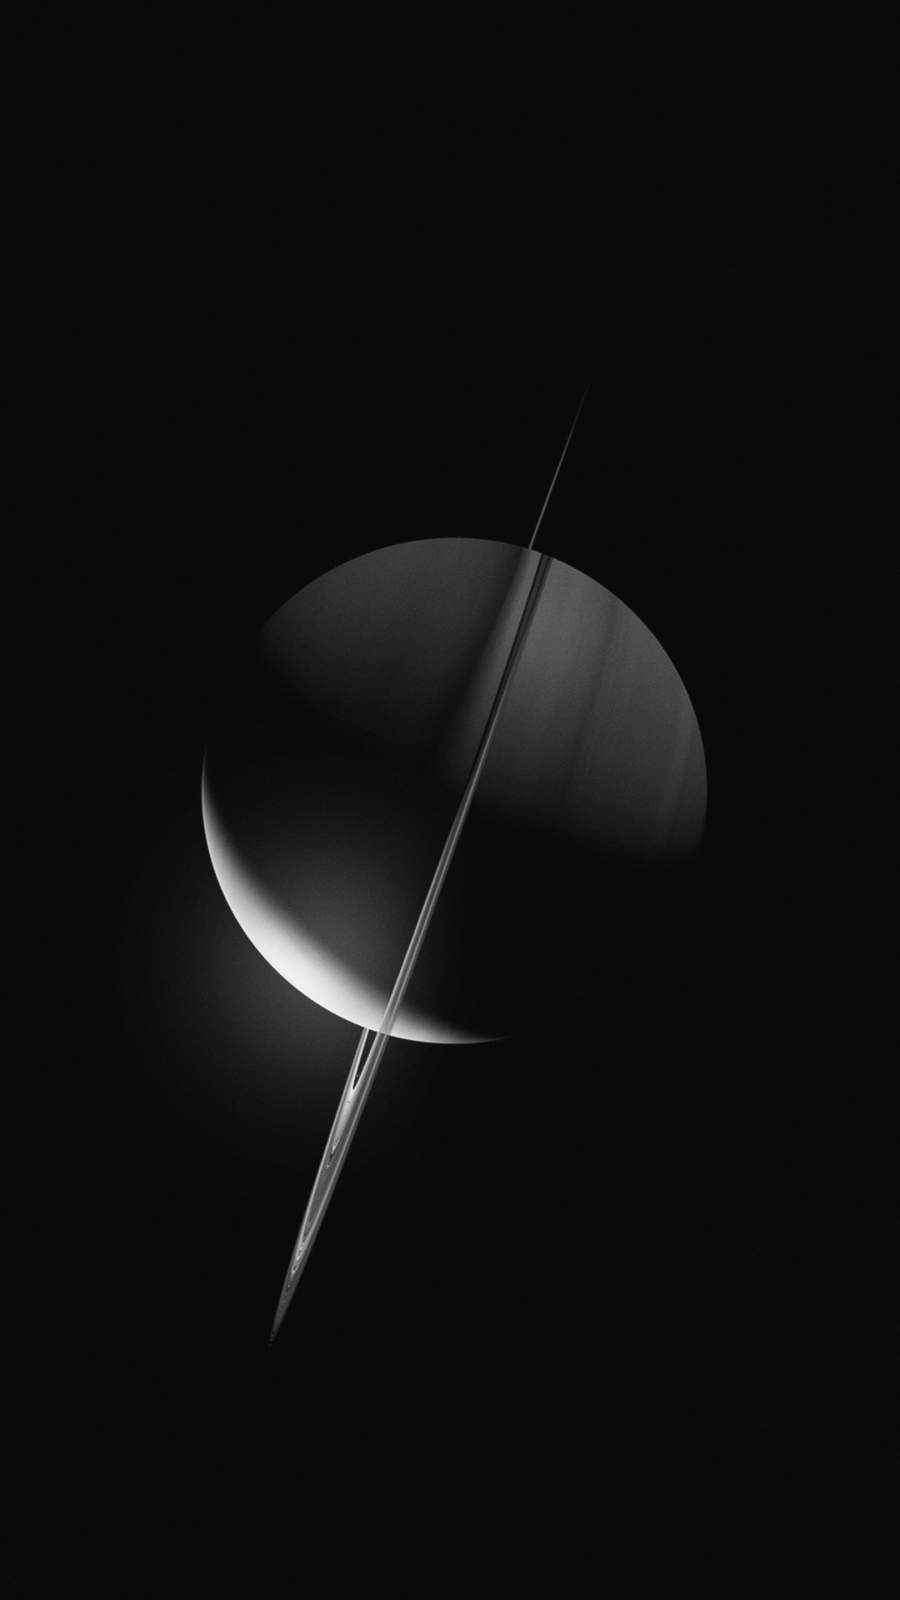 The Saturn iPhone Wallpaper